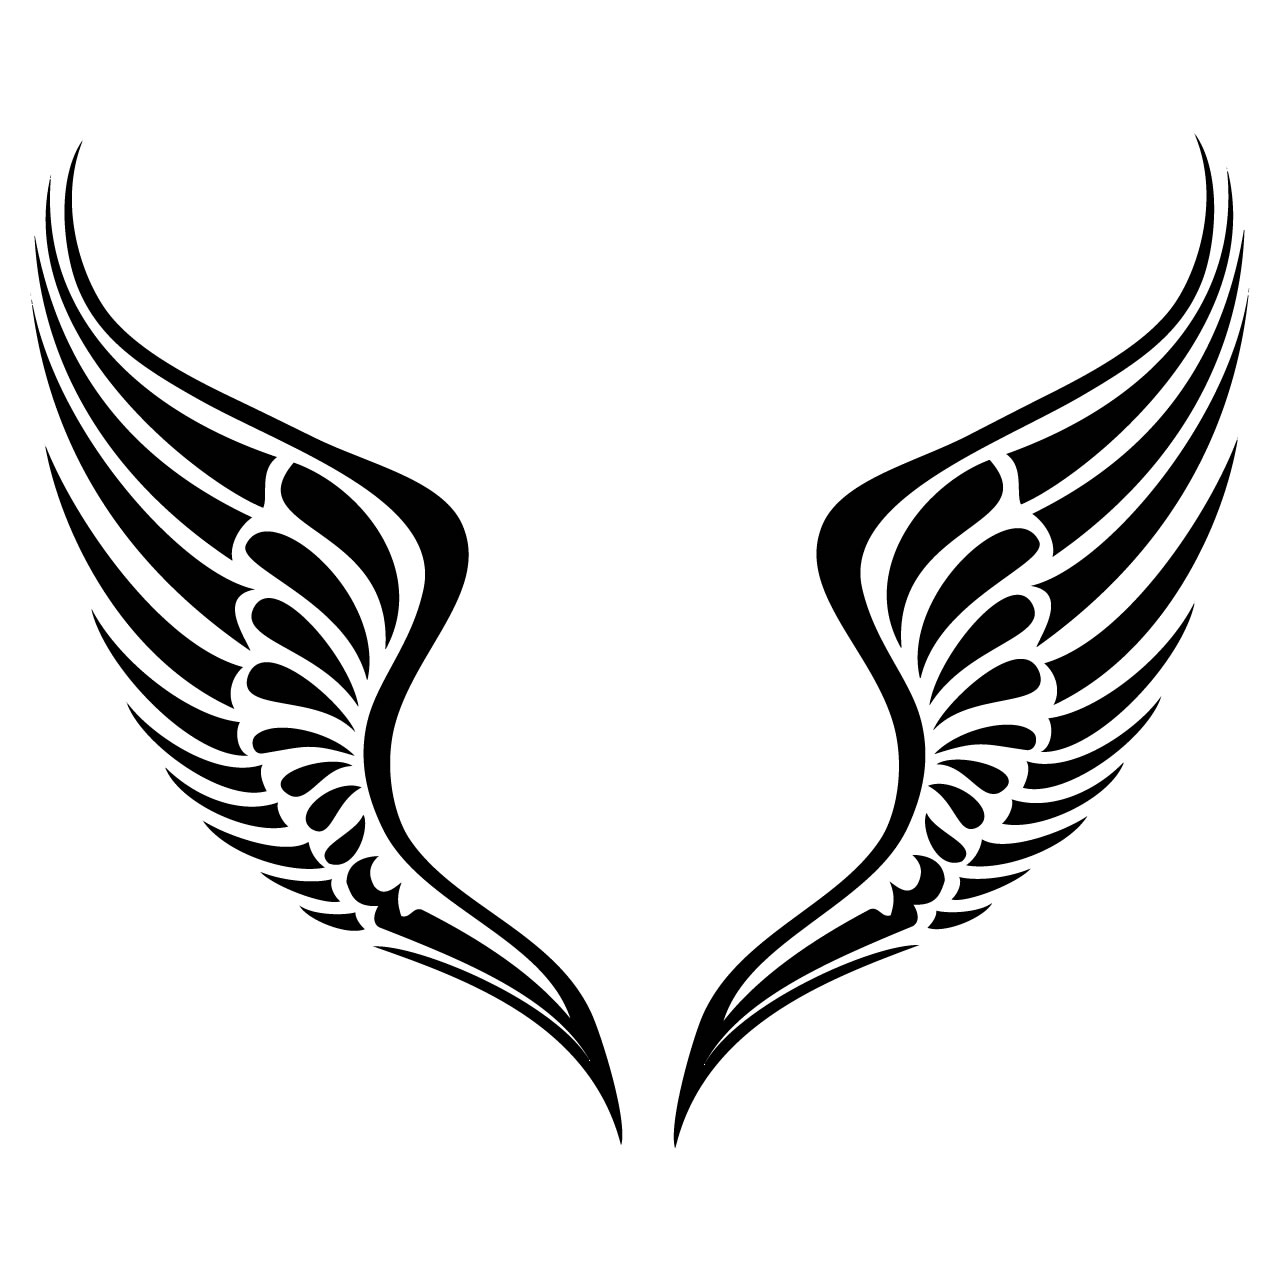 Halo clipart free wing Clipart Tribal Free Savoronmorehead Tribal